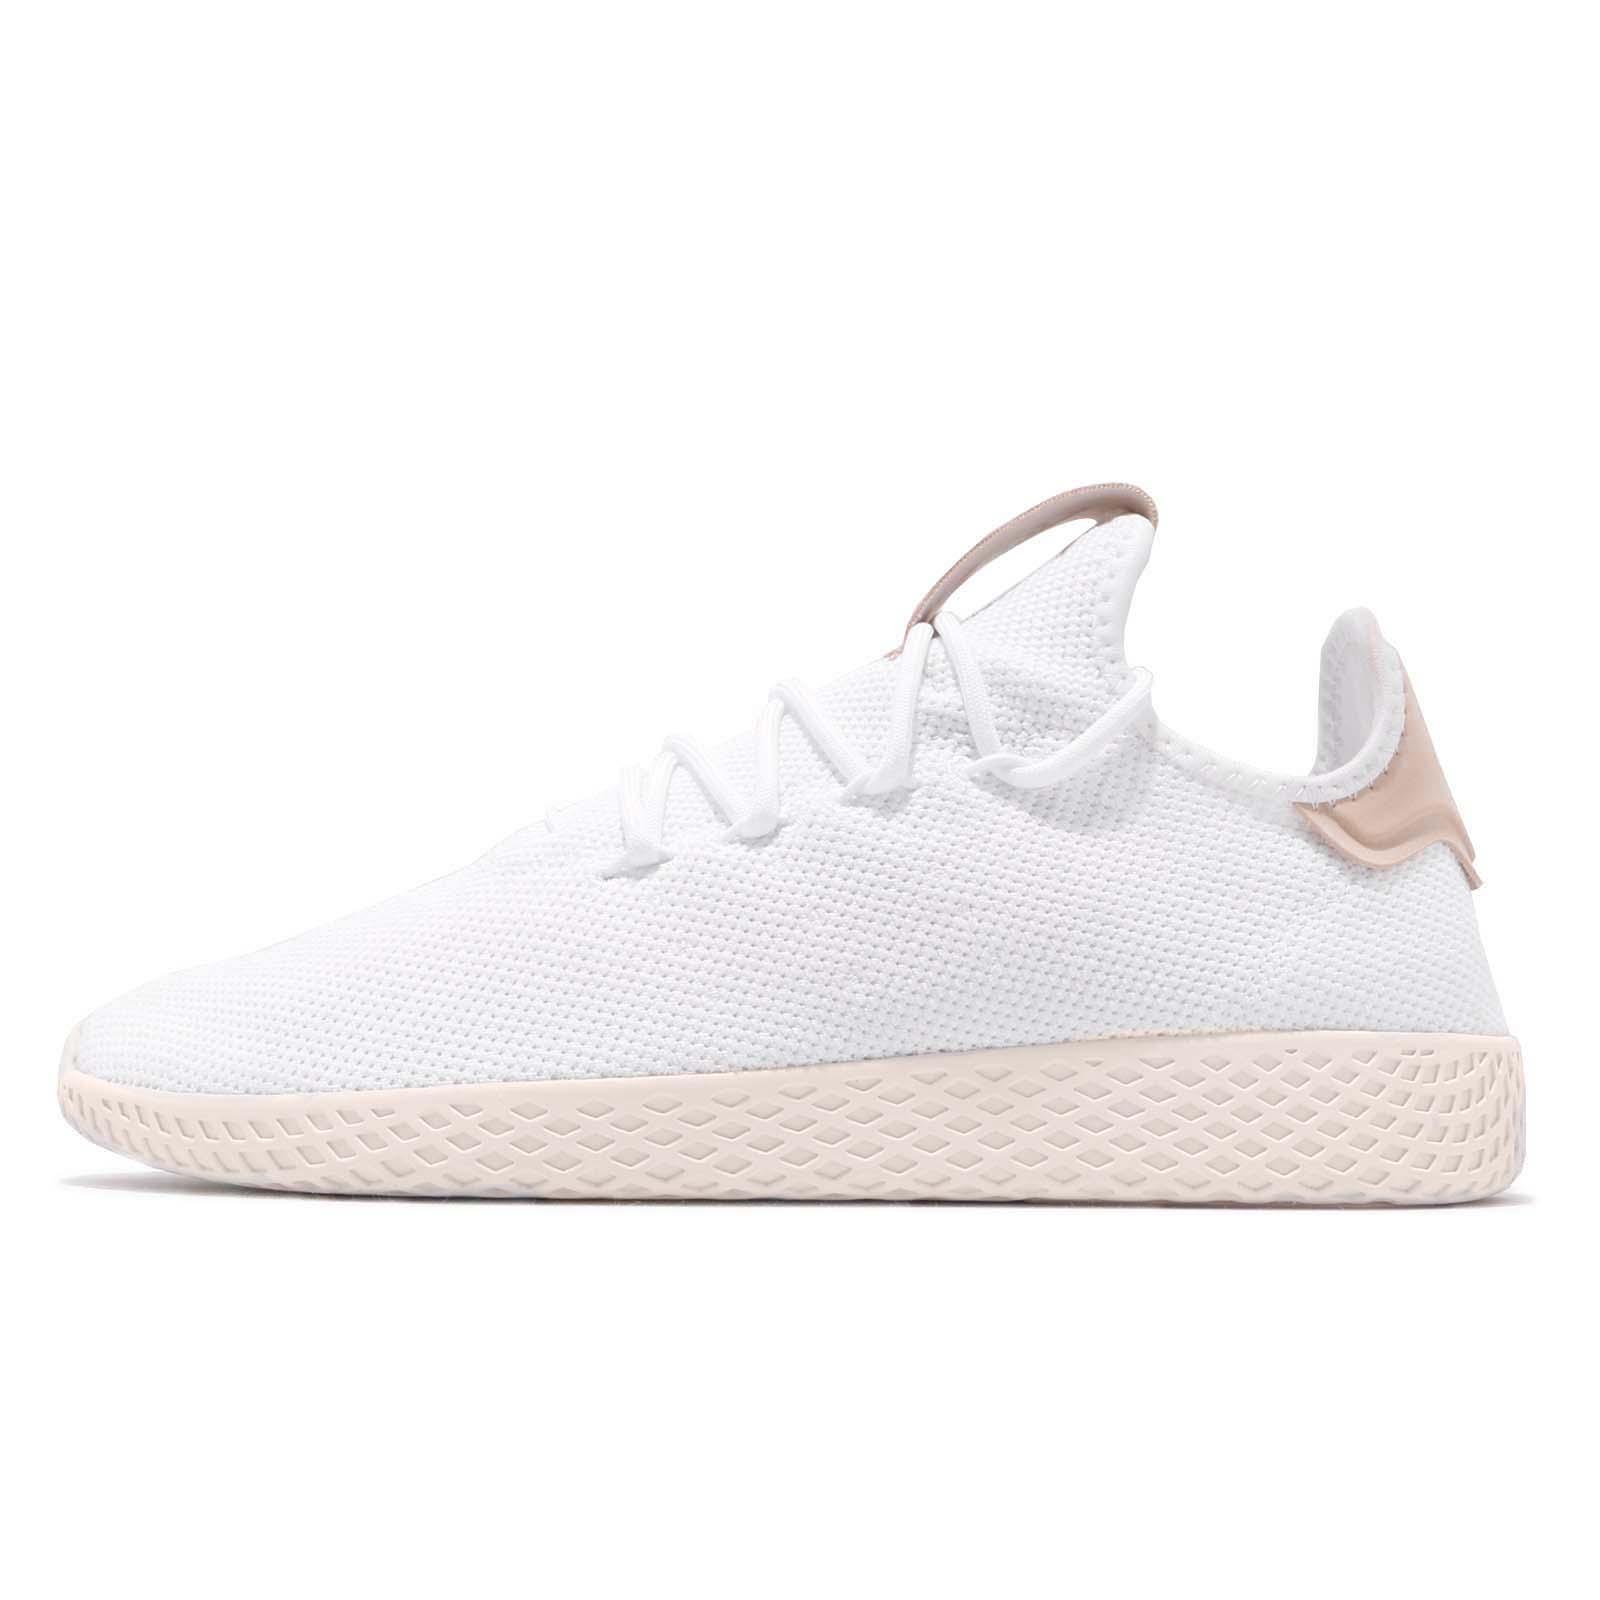 Adidas Originals PW Beige Tennis Hu Pharrell Williams bianca Beige PW Uomo   848340